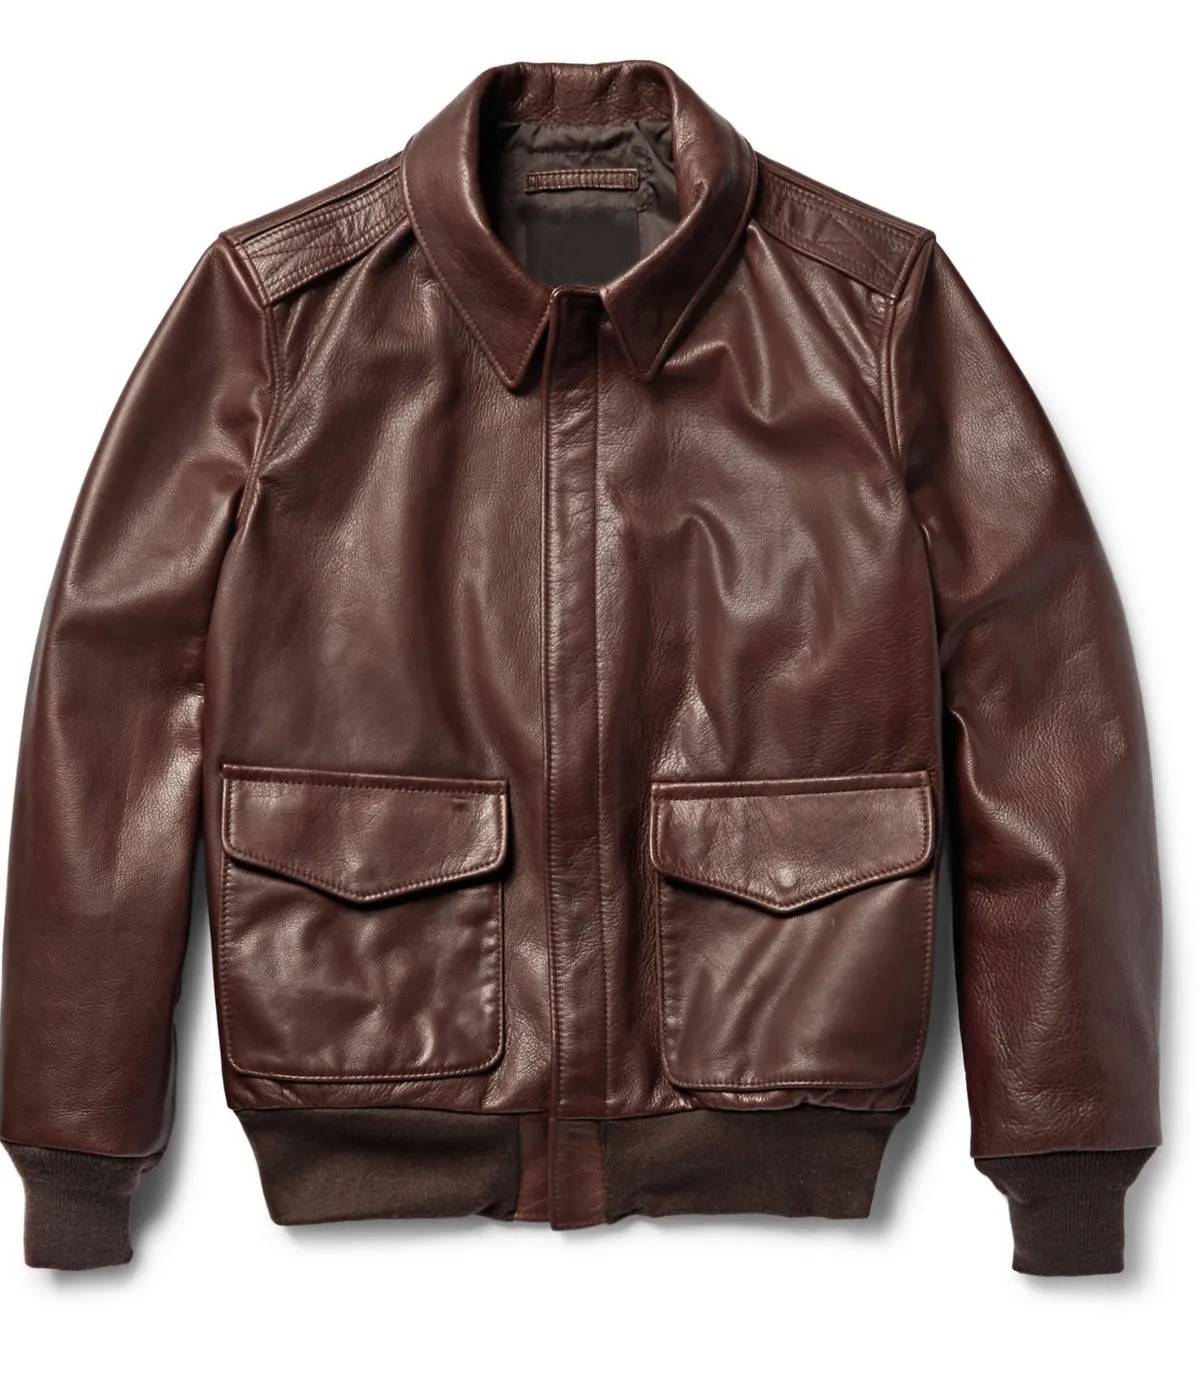 adam-spencer-leather-jacket